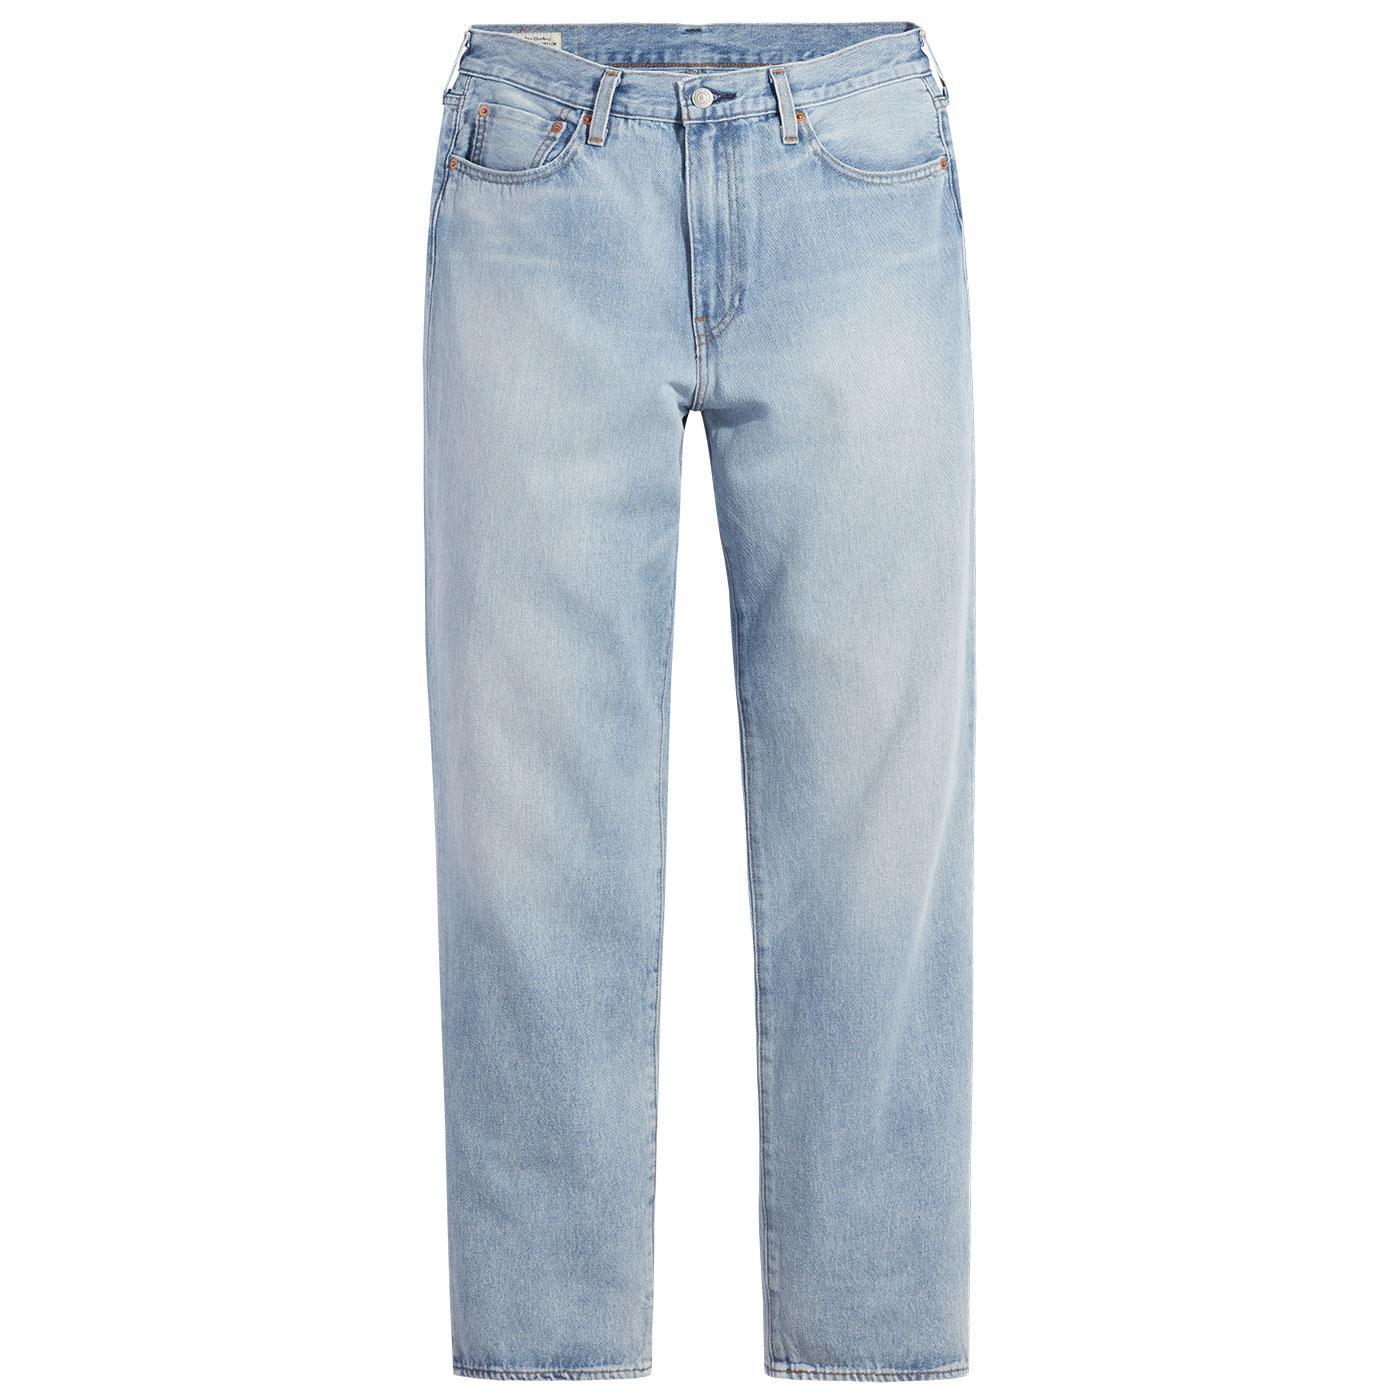 LEVI'S Stay Loose 90s Denim Jeans (Service Light)